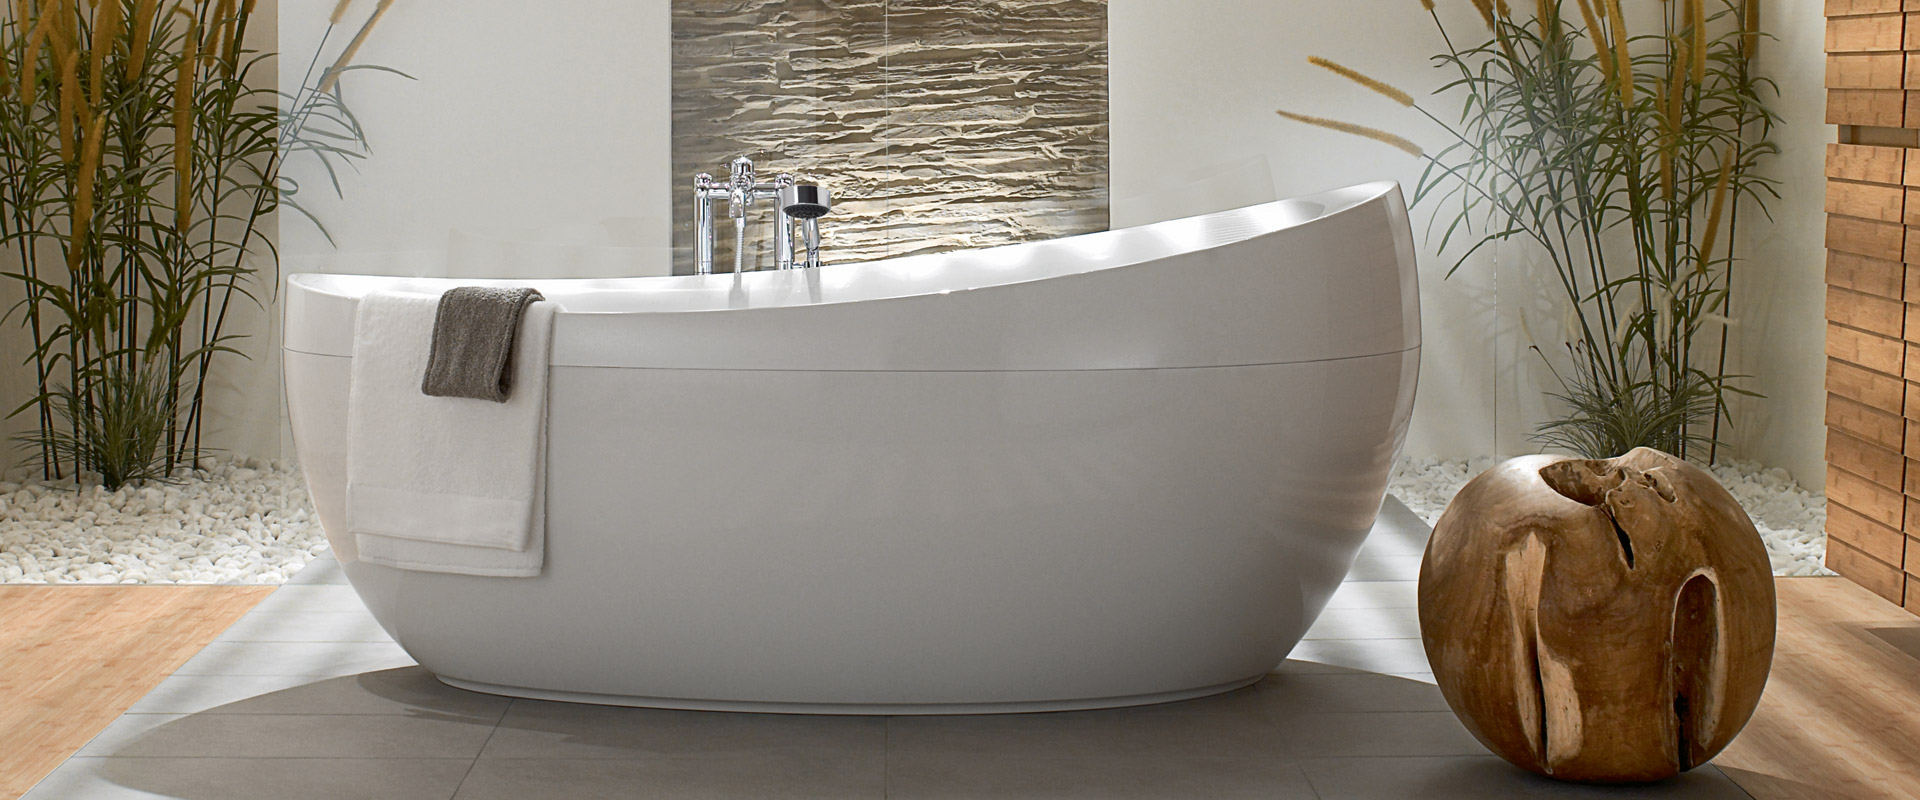 de collectie aveo van villeroy boch moderne vormgeving. Black Bedroom Furniture Sets. Home Design Ideas